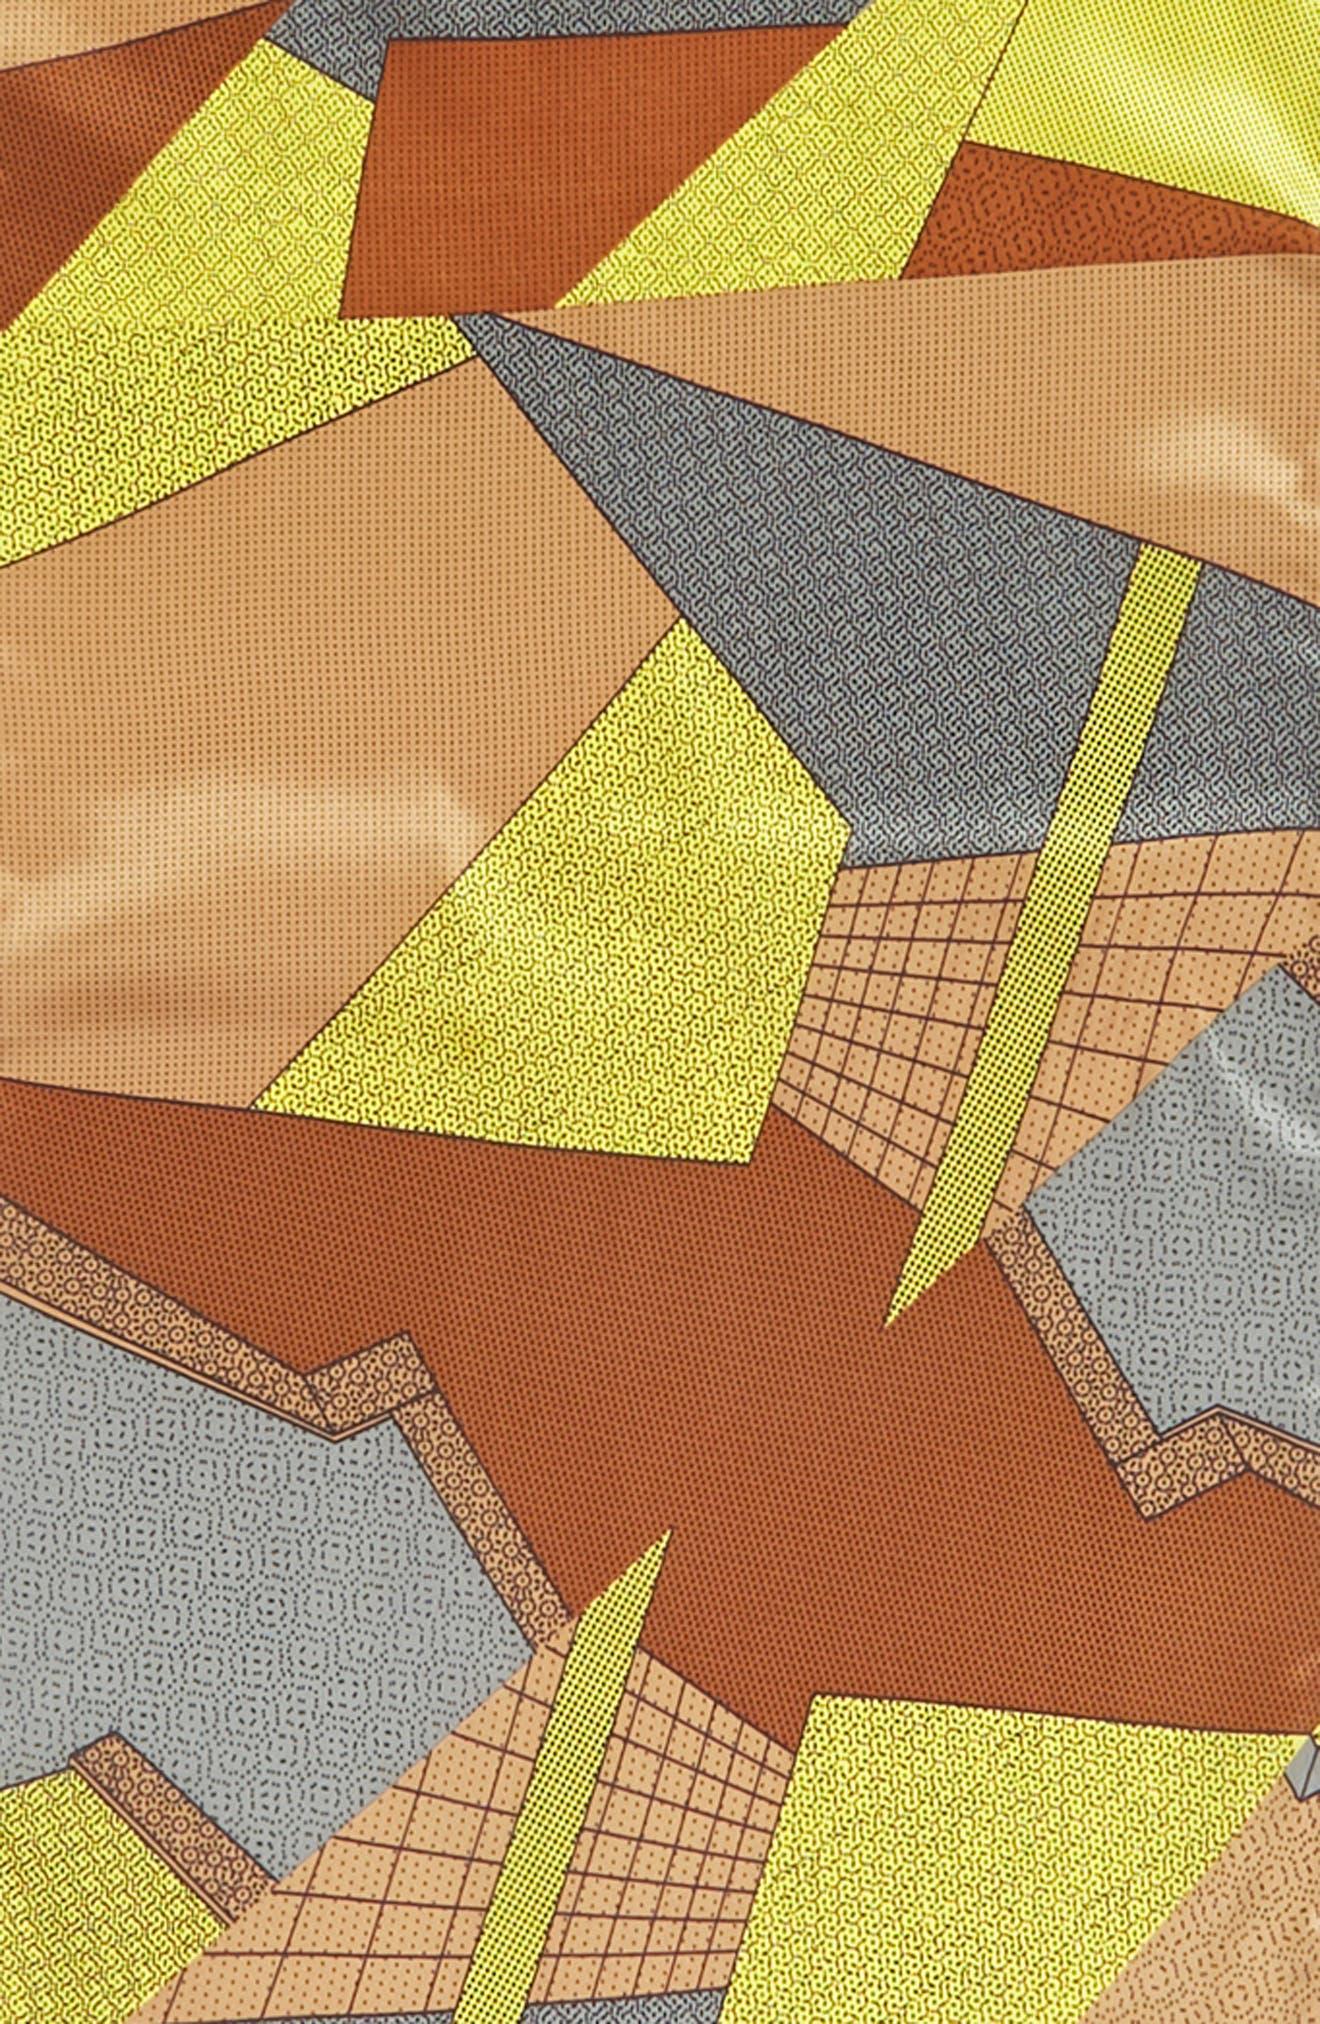 MEMPHIS GROUP, MEMPHIS Milano Print Silk Scarf, Alternate thumbnail 3, color, 700